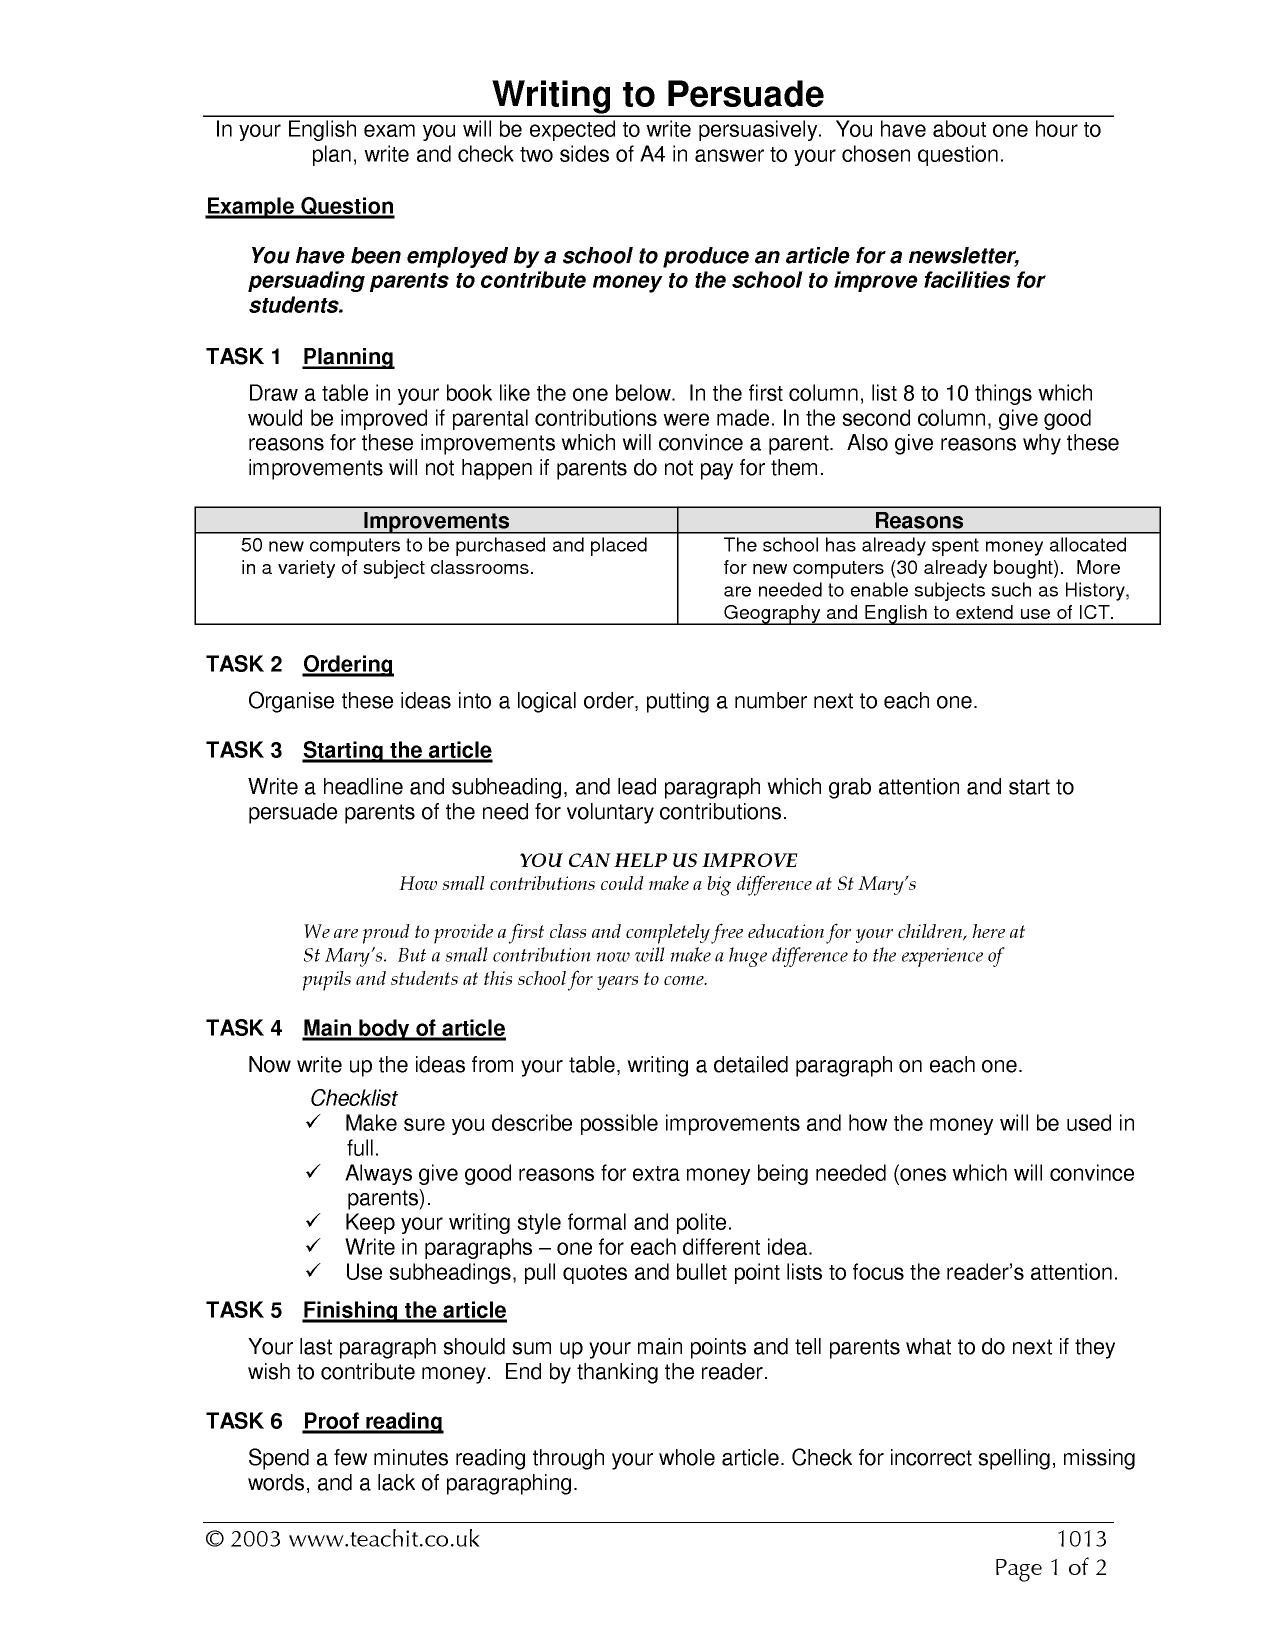 Ks4 writing argument and persuasive writing teachit english 4 preview ks4 writing spiritdancerdesigns Images